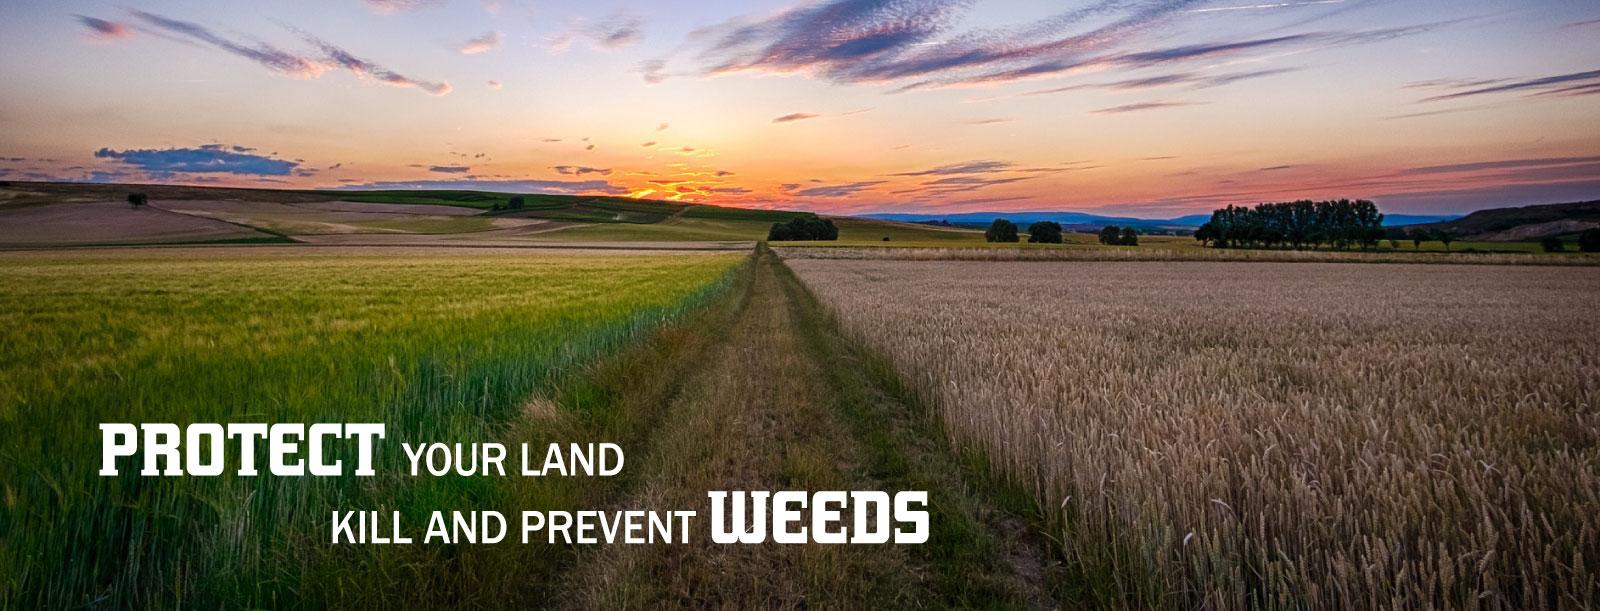 406 Weed Control - slideshow2